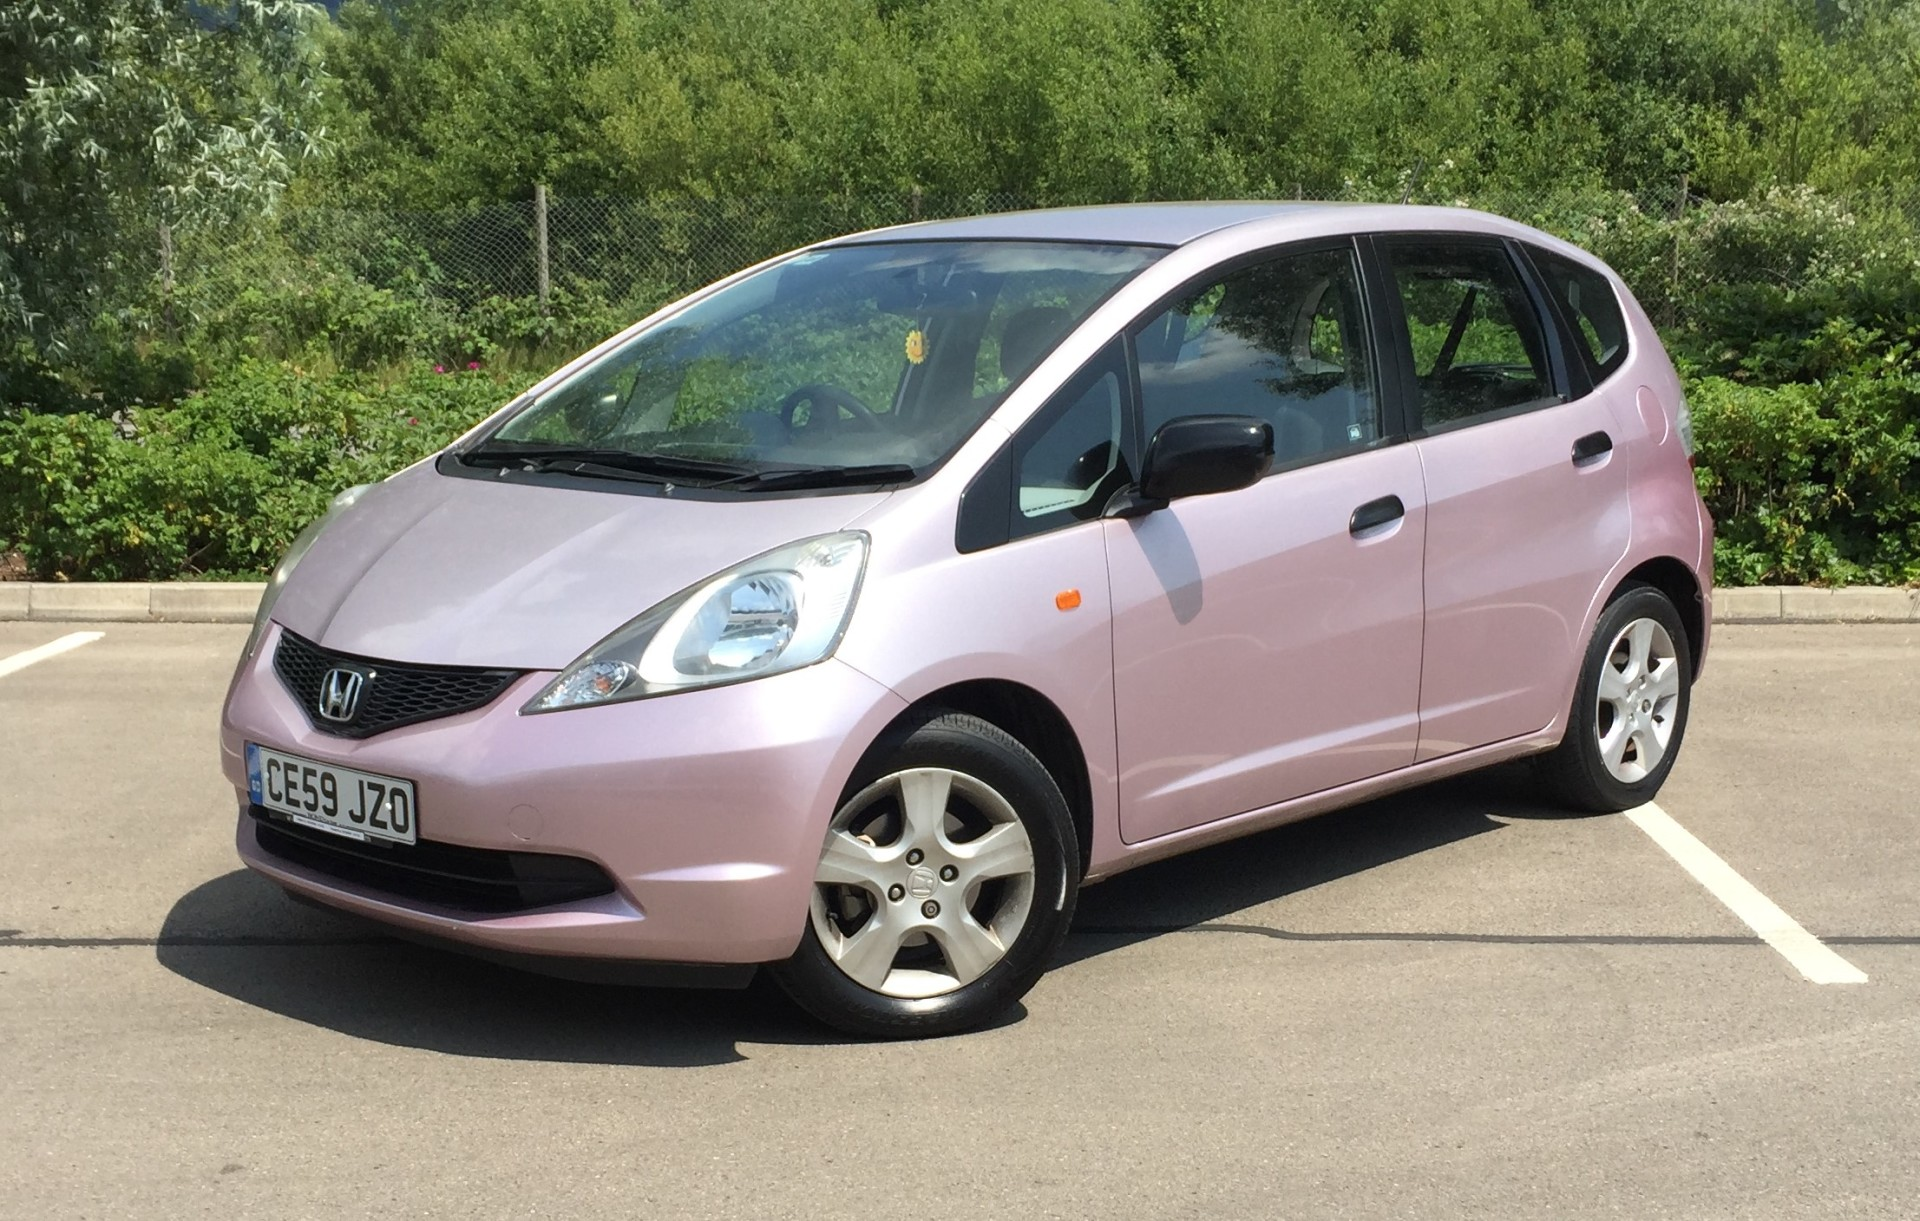 £23/week £4,385 Honda Jazz 1.2 SE (VSA) 22,817 miles